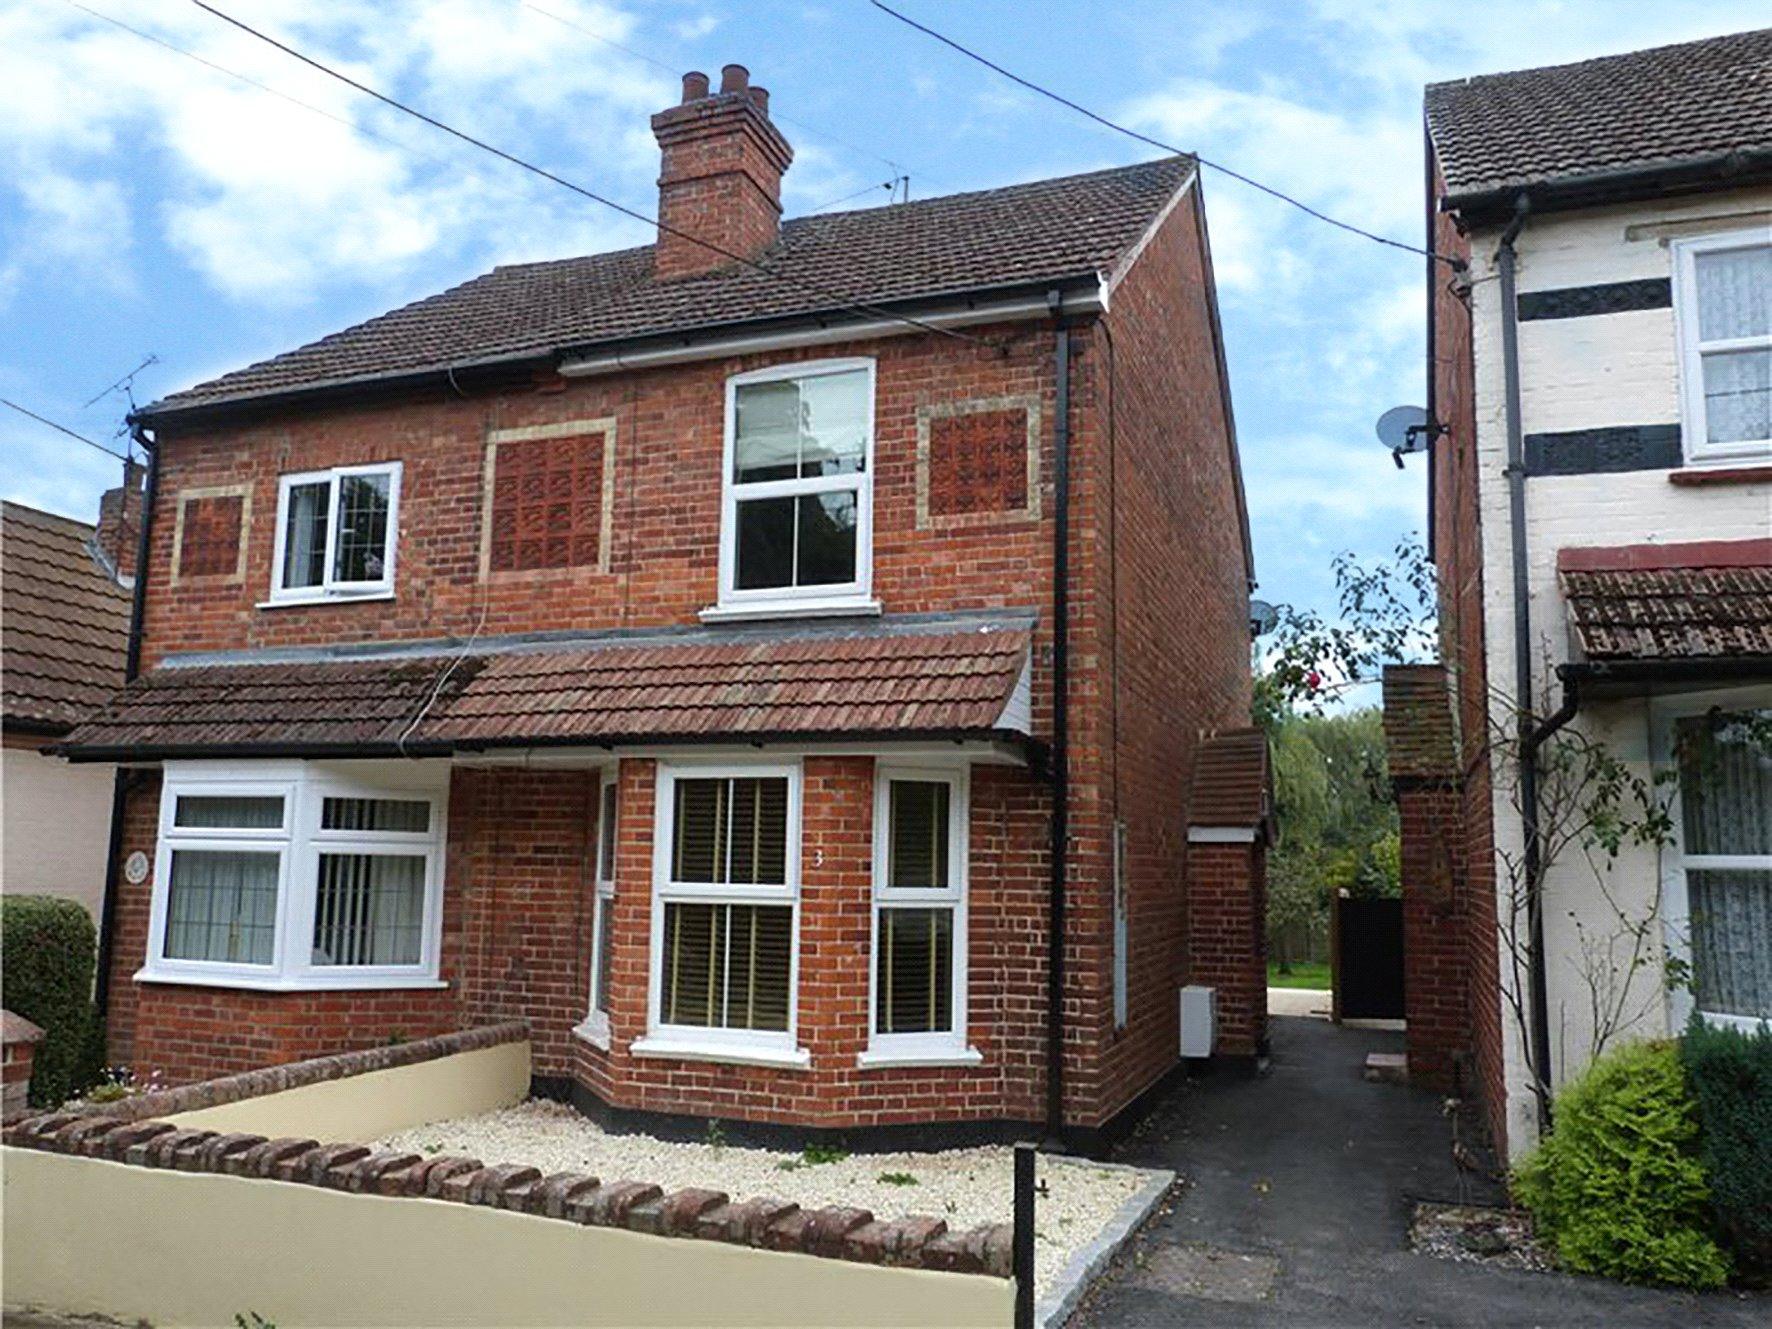 2 Bedrooms Semi Detached House for sale in North View, Amen Corner, Binfield, Bracknell, RG12